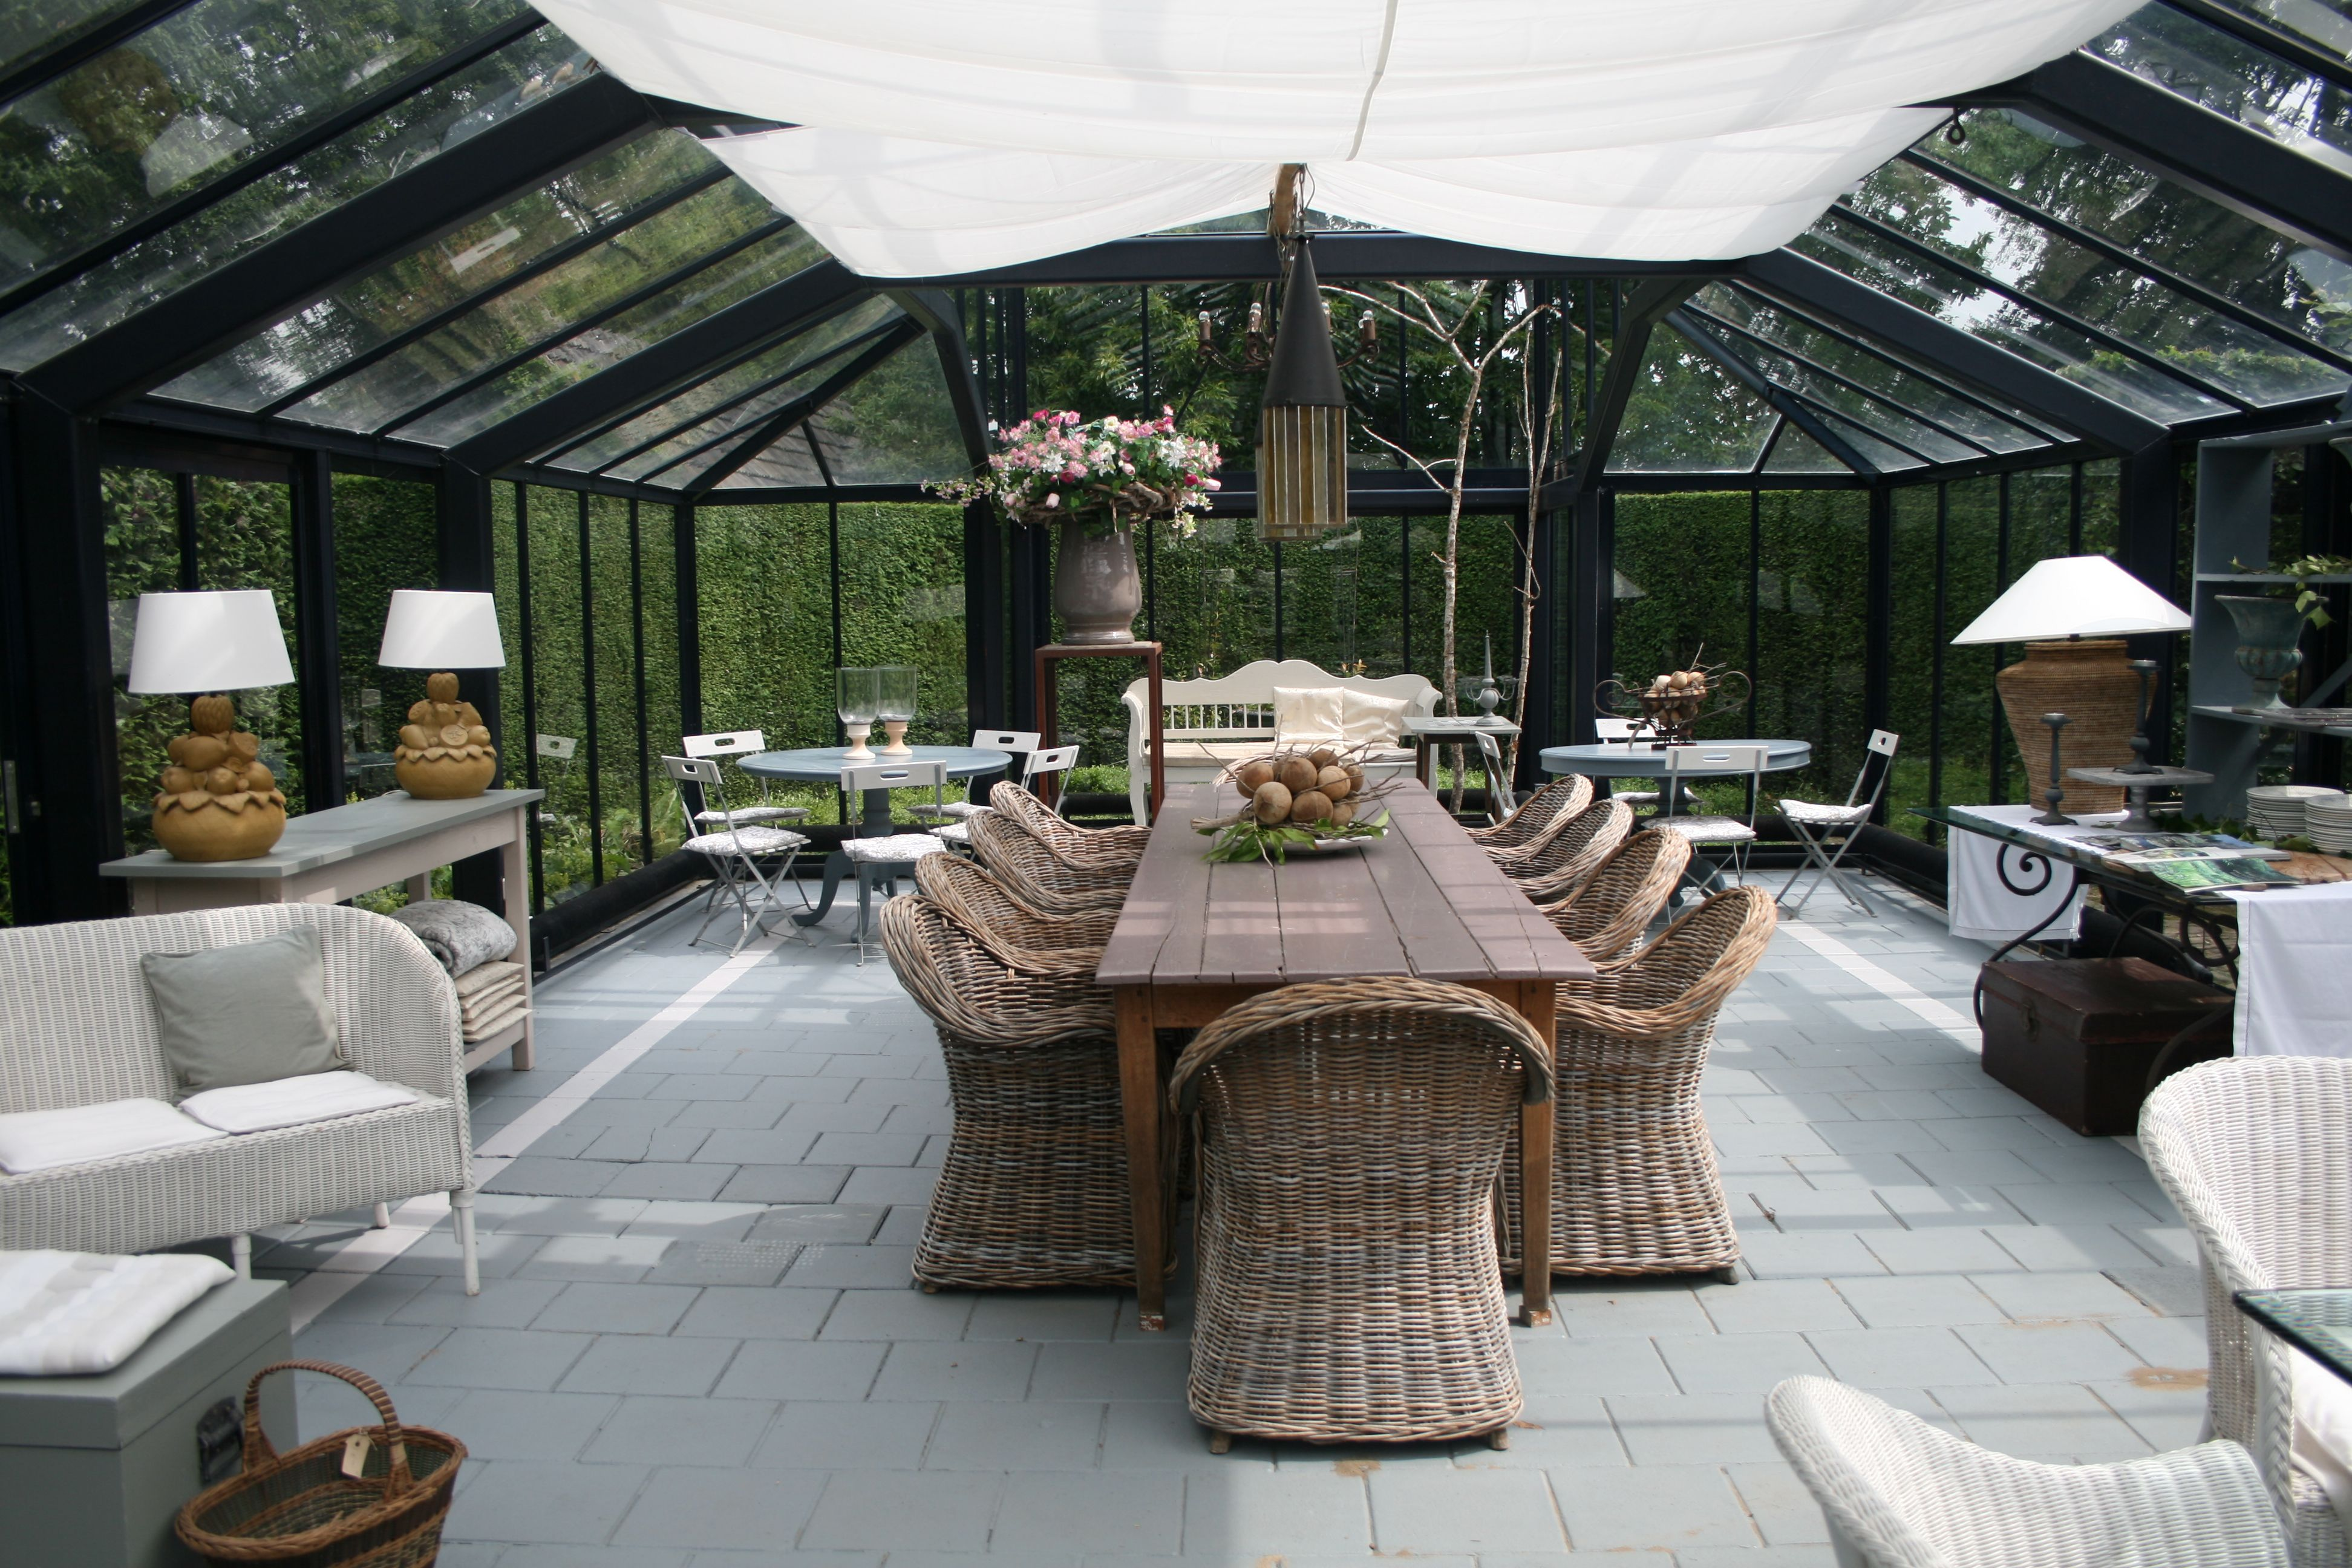 KORBMÖBEL / WINTERGARTEN / GARTENREISE HOLLAND | Garten | Pinterest ...